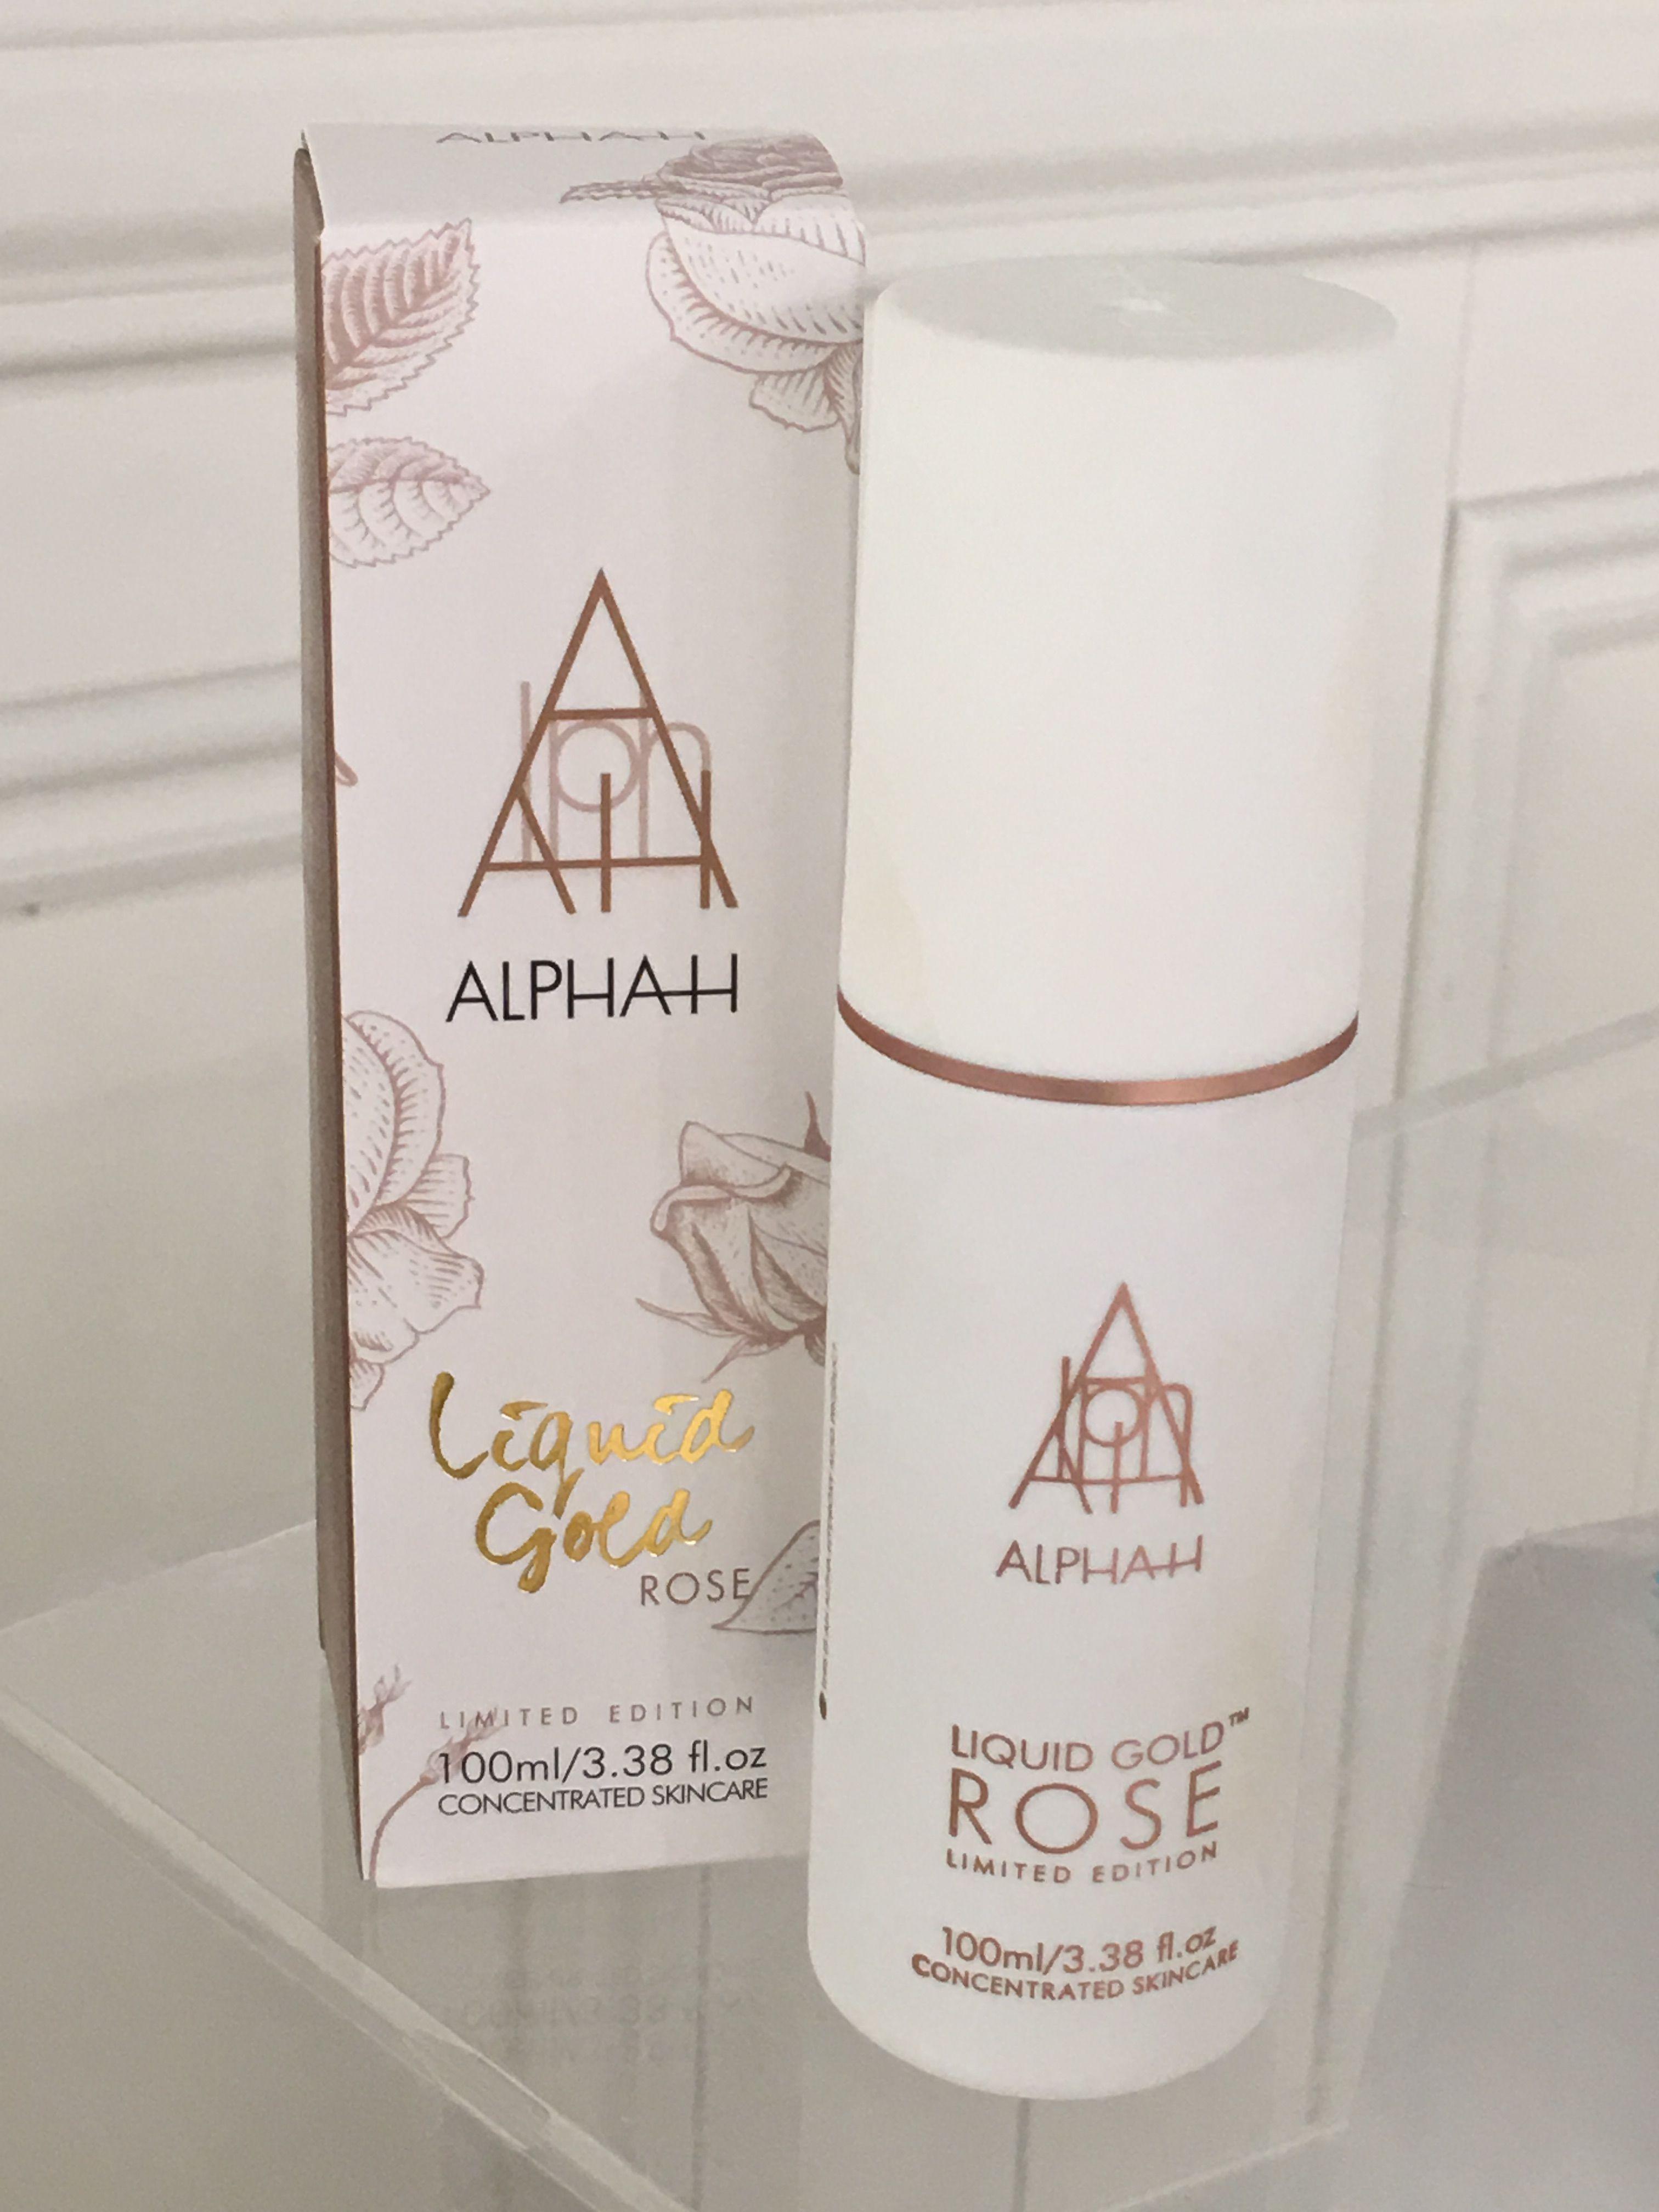 Launching the Alpha H ROSE Liquid gold!!! April 2017